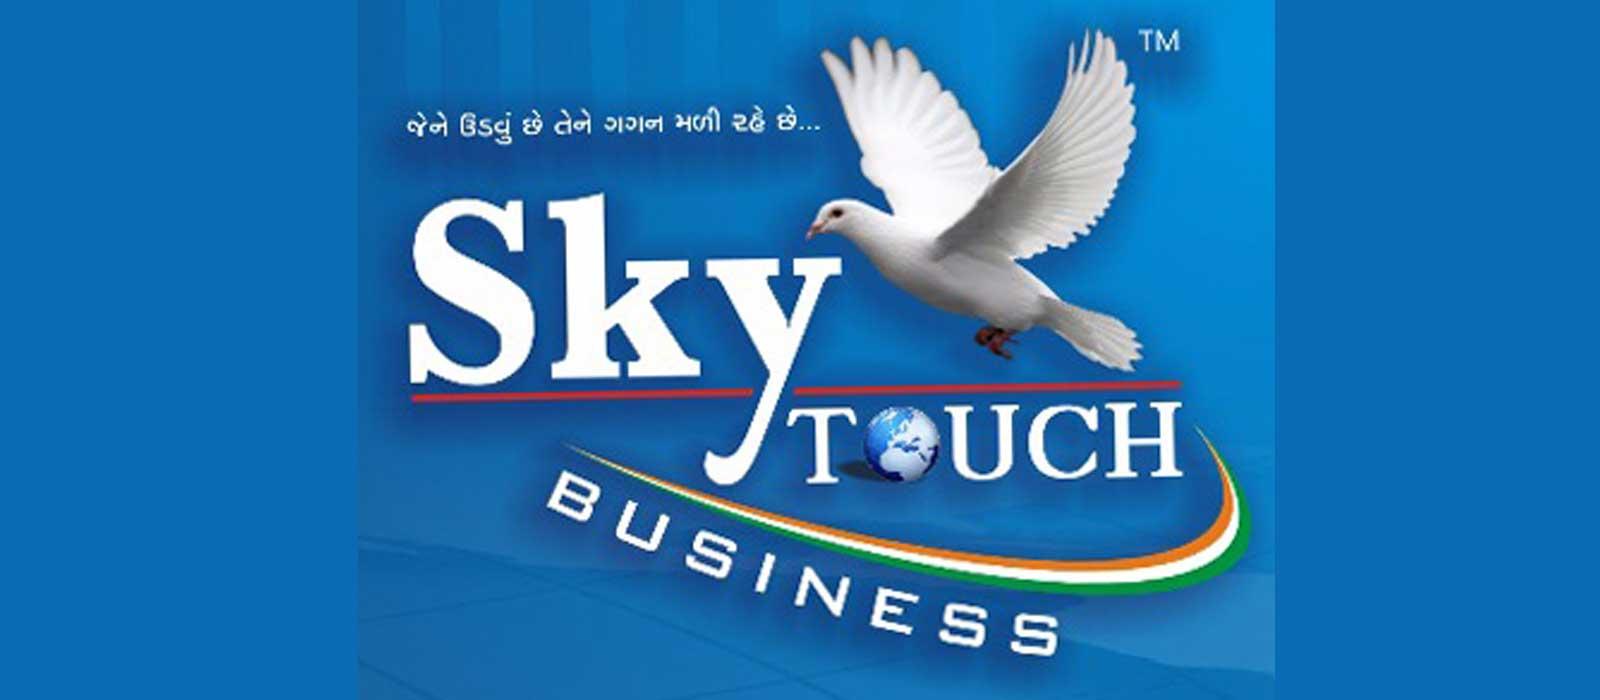 Sky Touch Business - Portfolio - Cipherhex technology